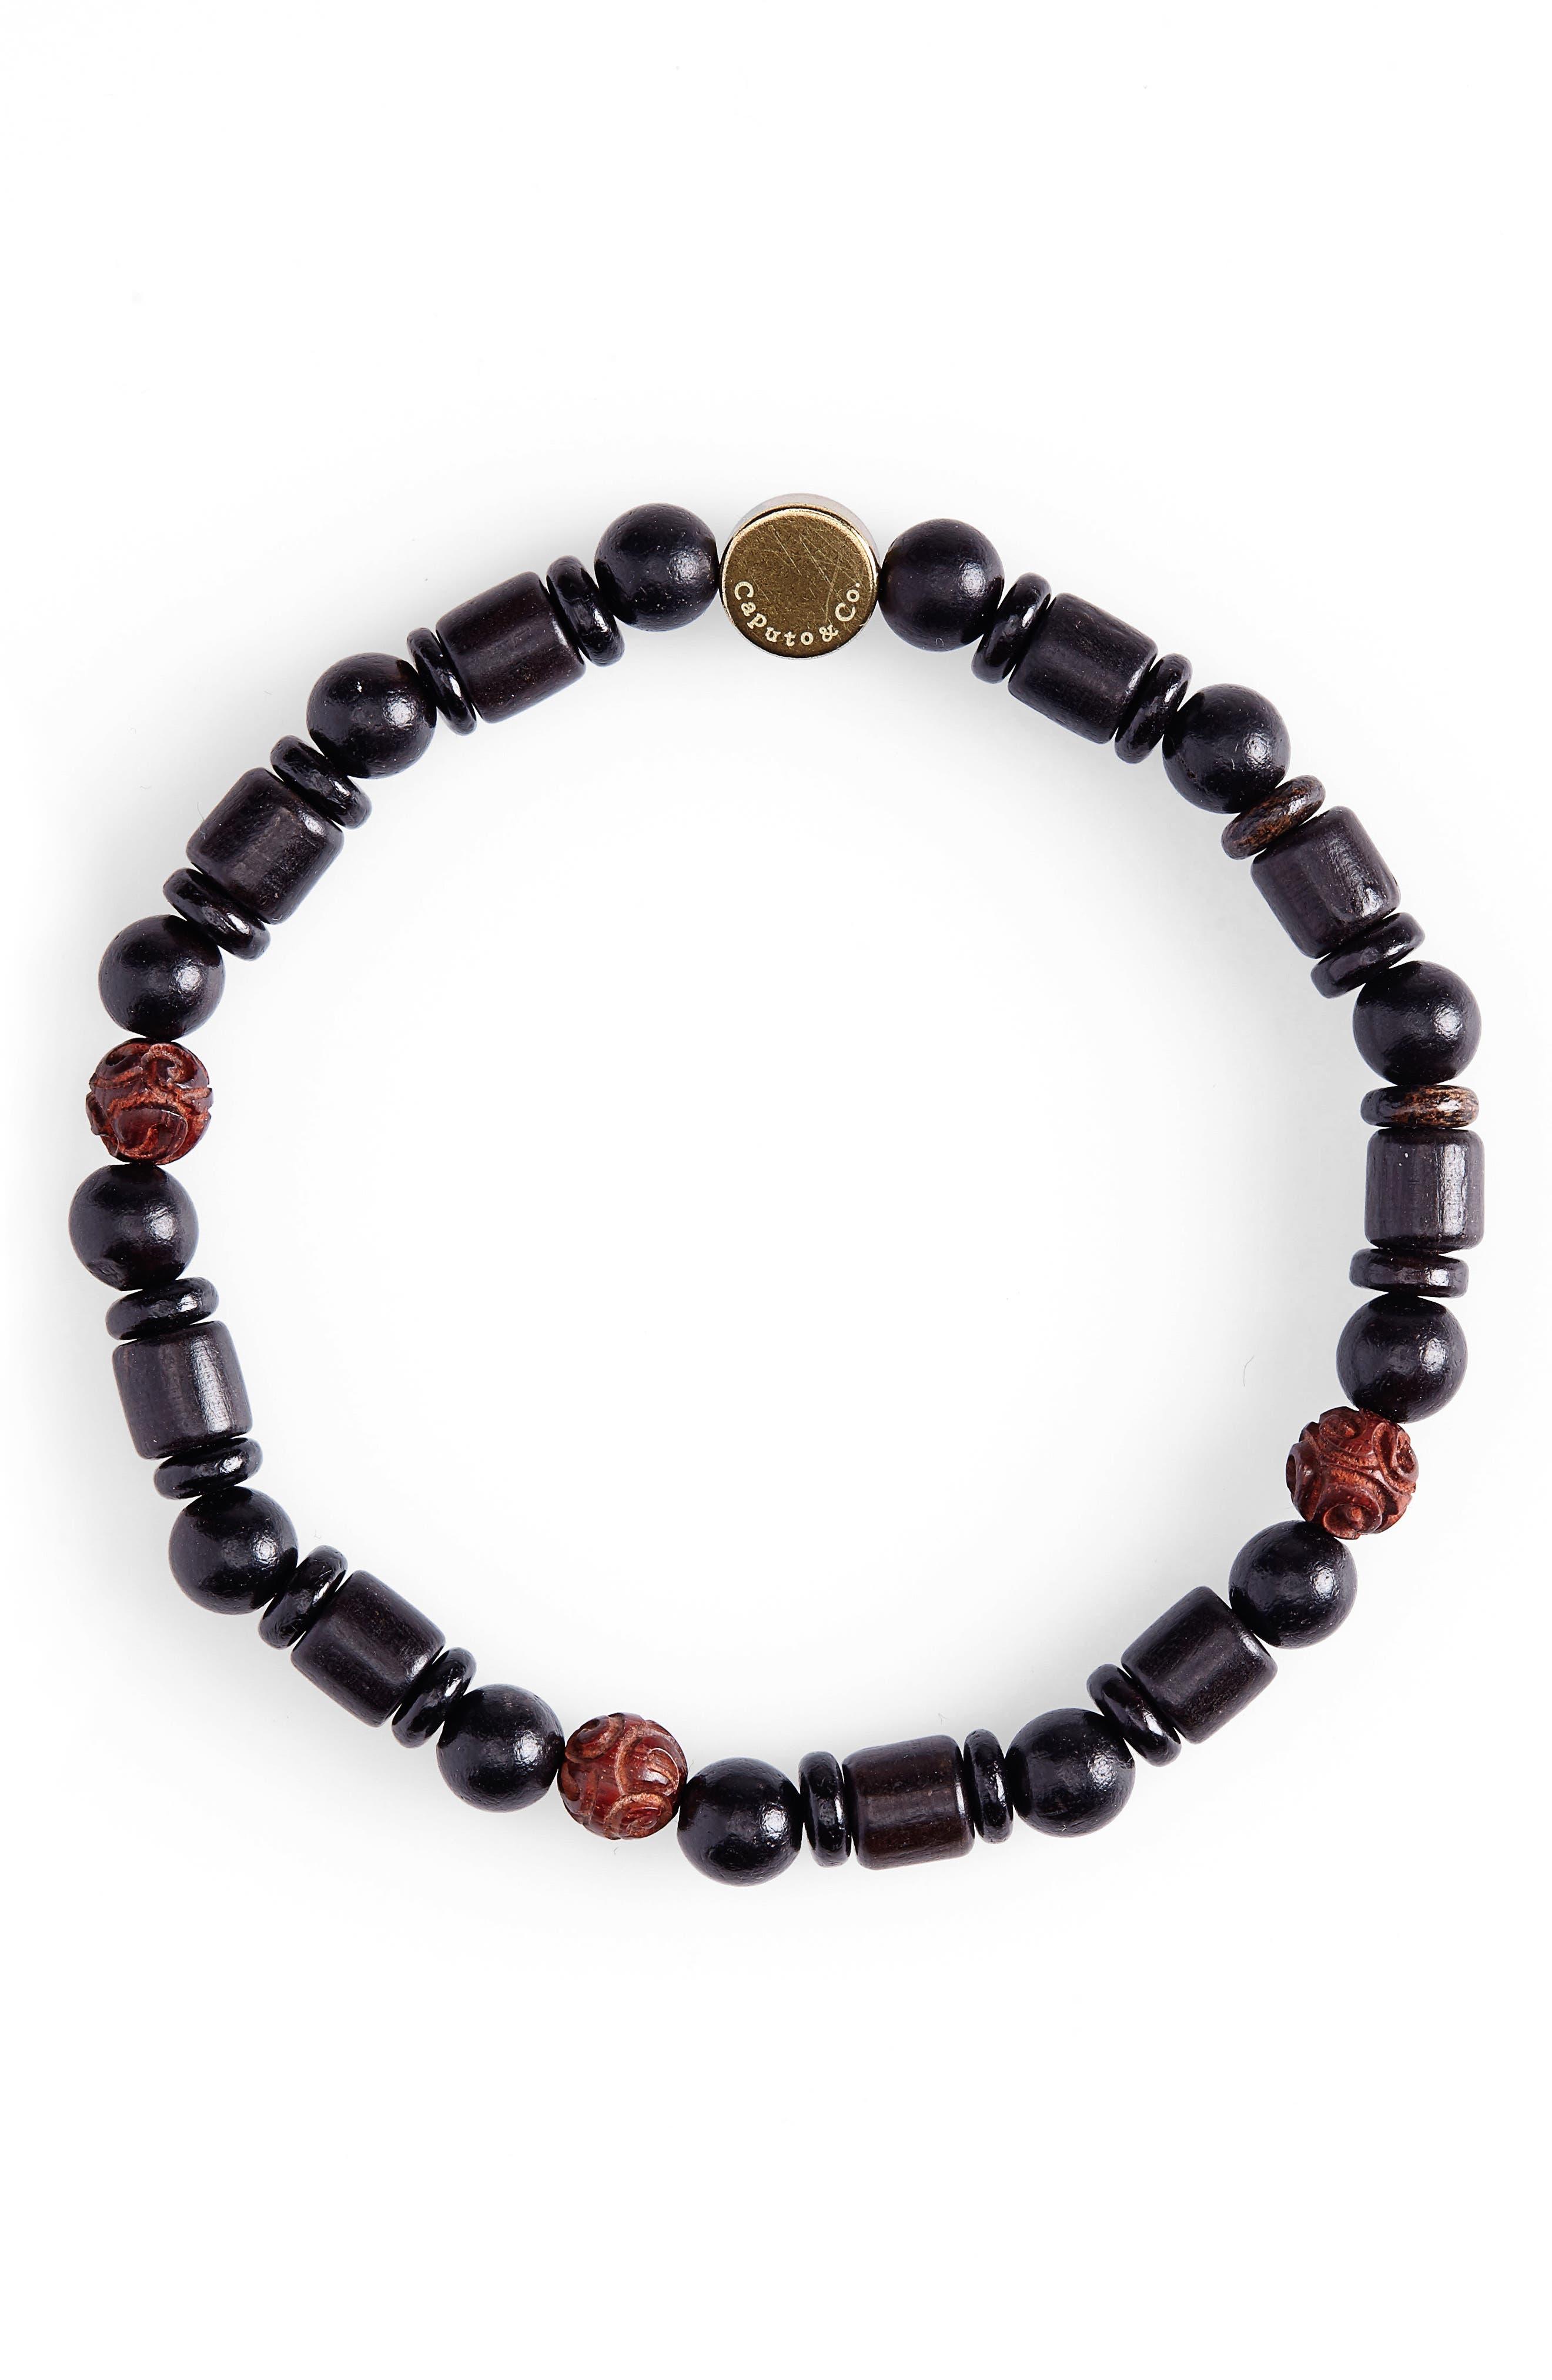 CAPUTO & CO. Reflection Bead Bracelet in Red Sandalwood